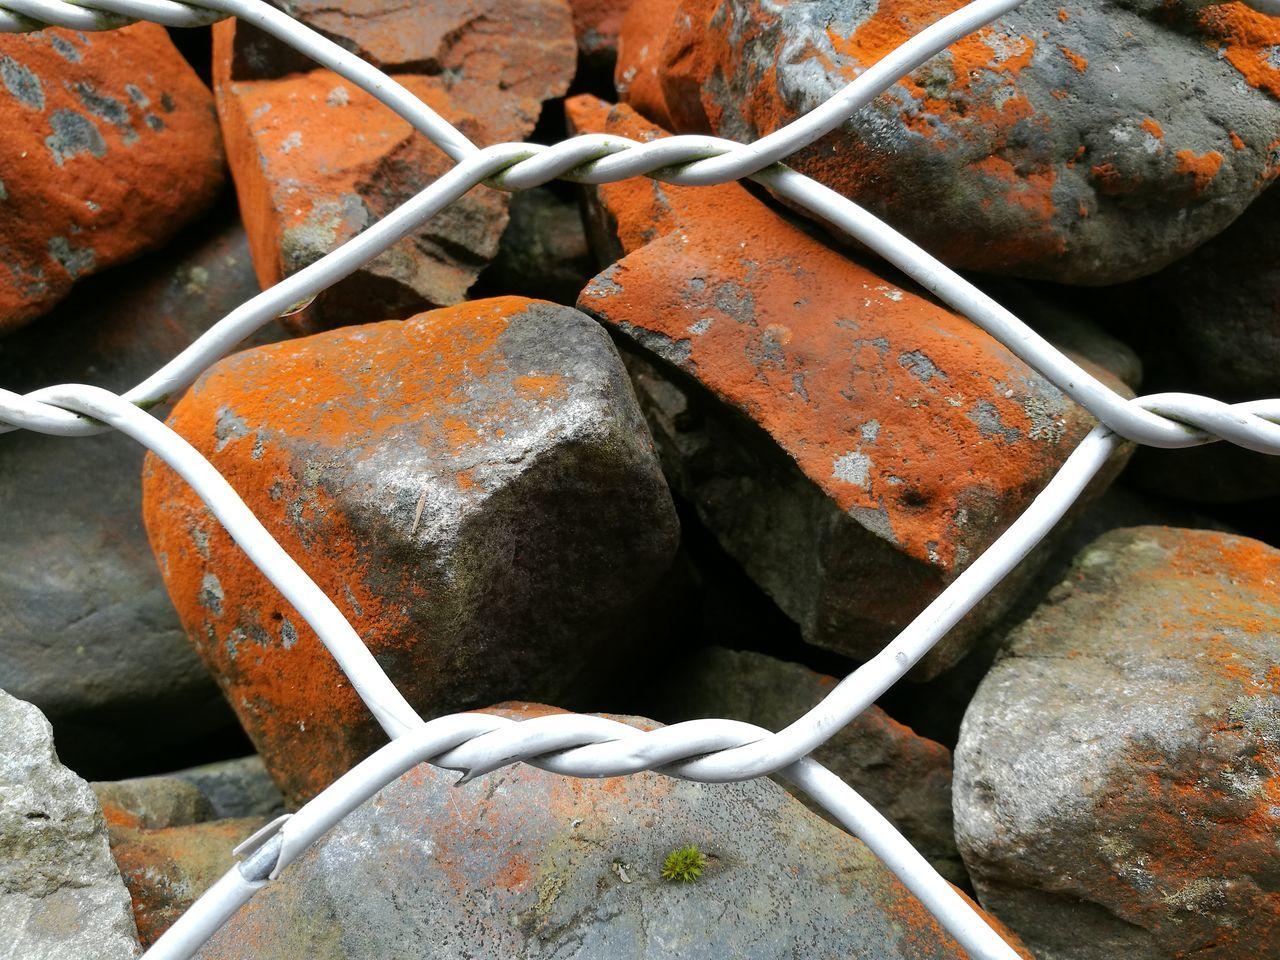 Metal Close-up Rock Lichen On A Rock